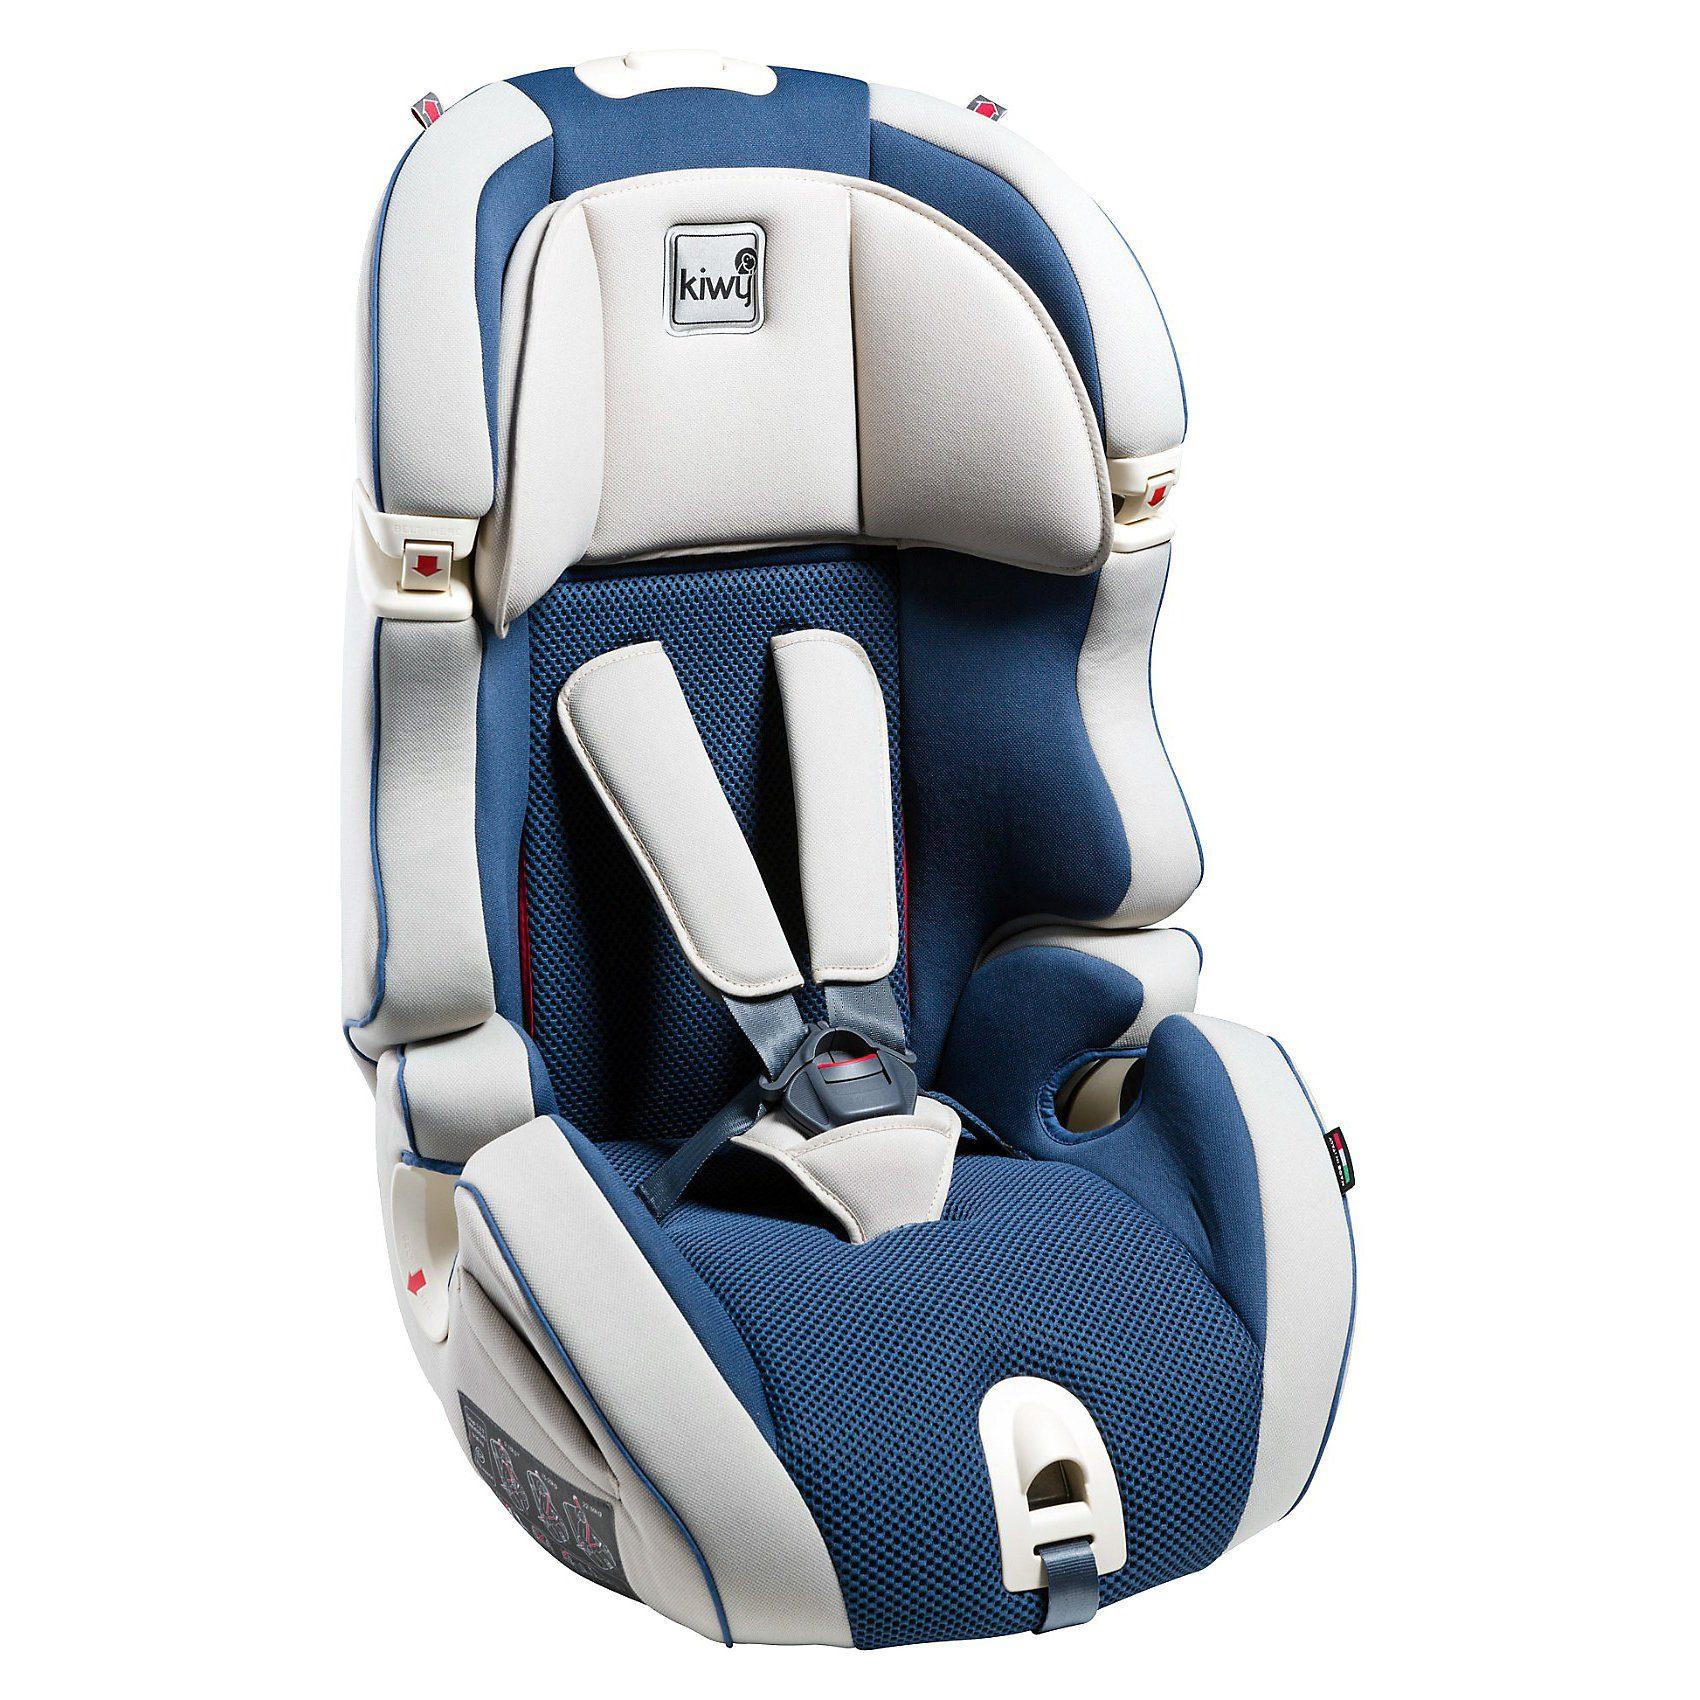 Kiwy Auto-Kindersitz SL123, Ocean, 2016